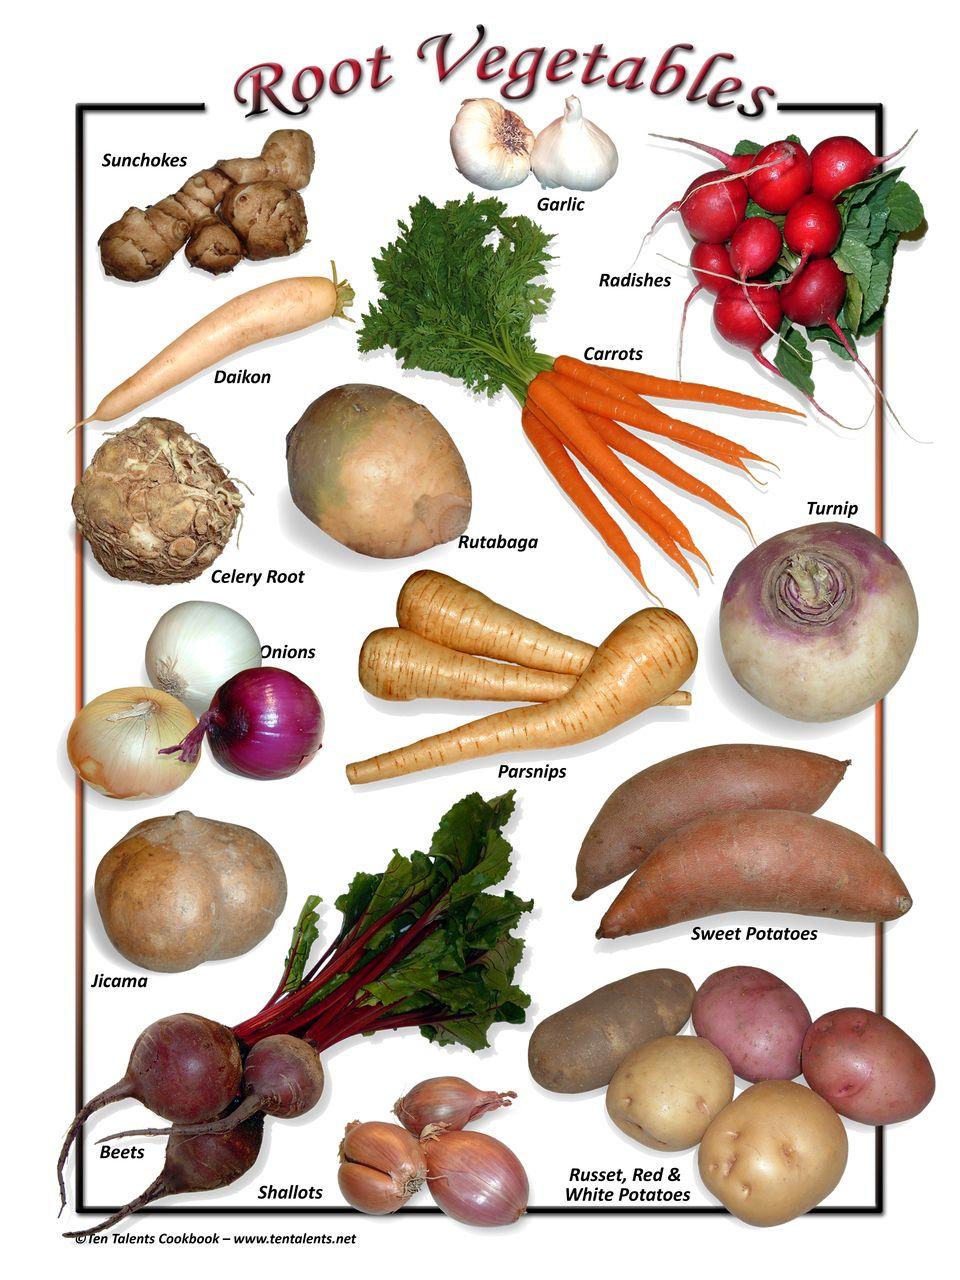 Root Vegetables Nutrition recipes, Vegetables, Root veggies